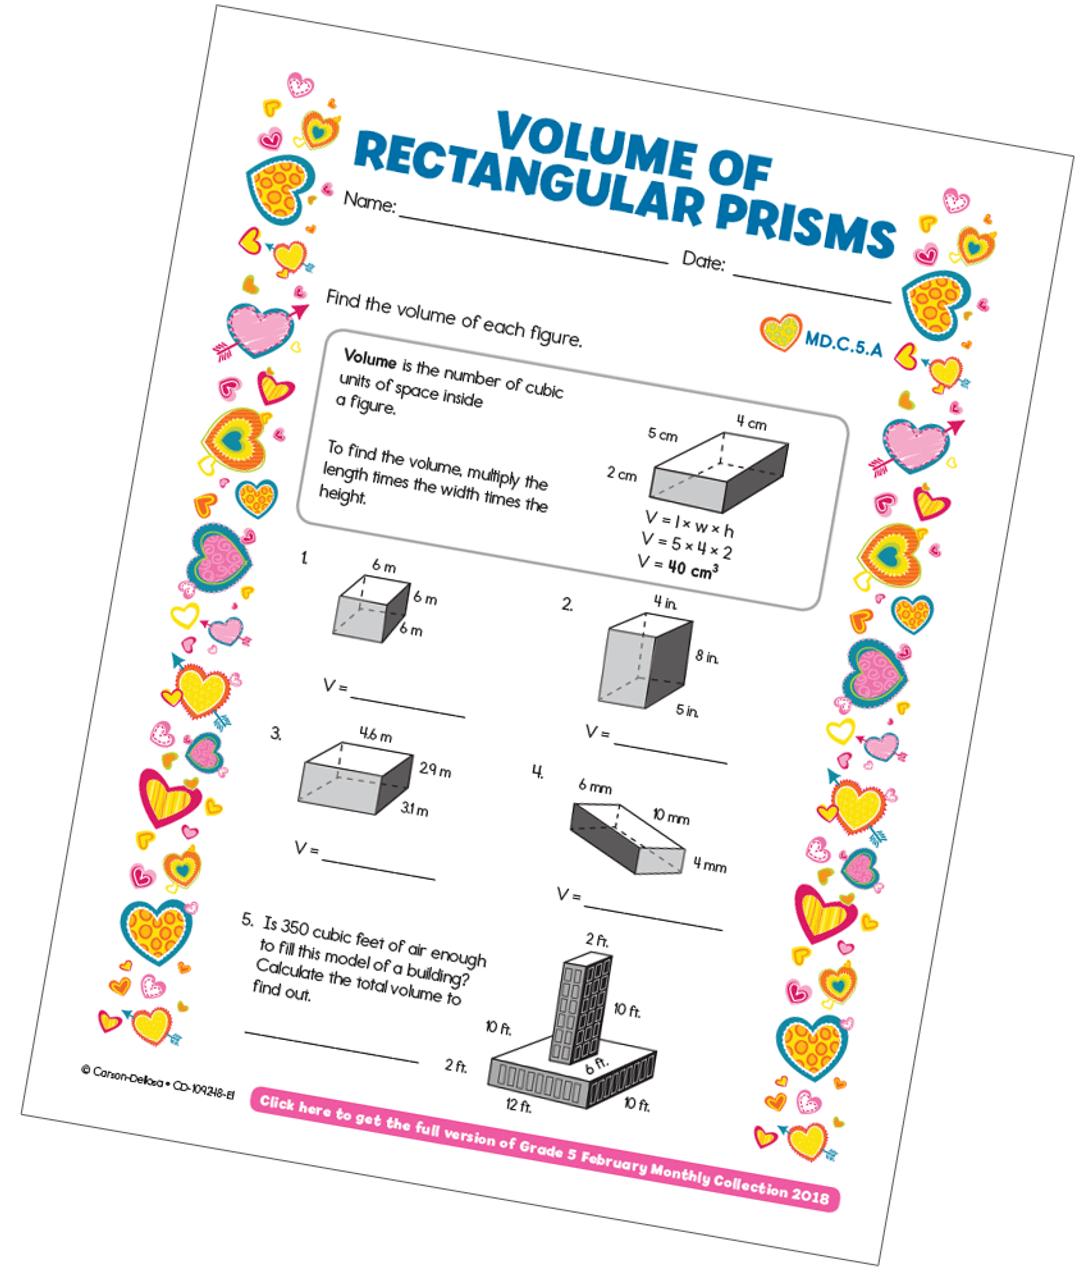 small resolution of Volume of Rectangular Prisms Free Printable   Carson Dellosa